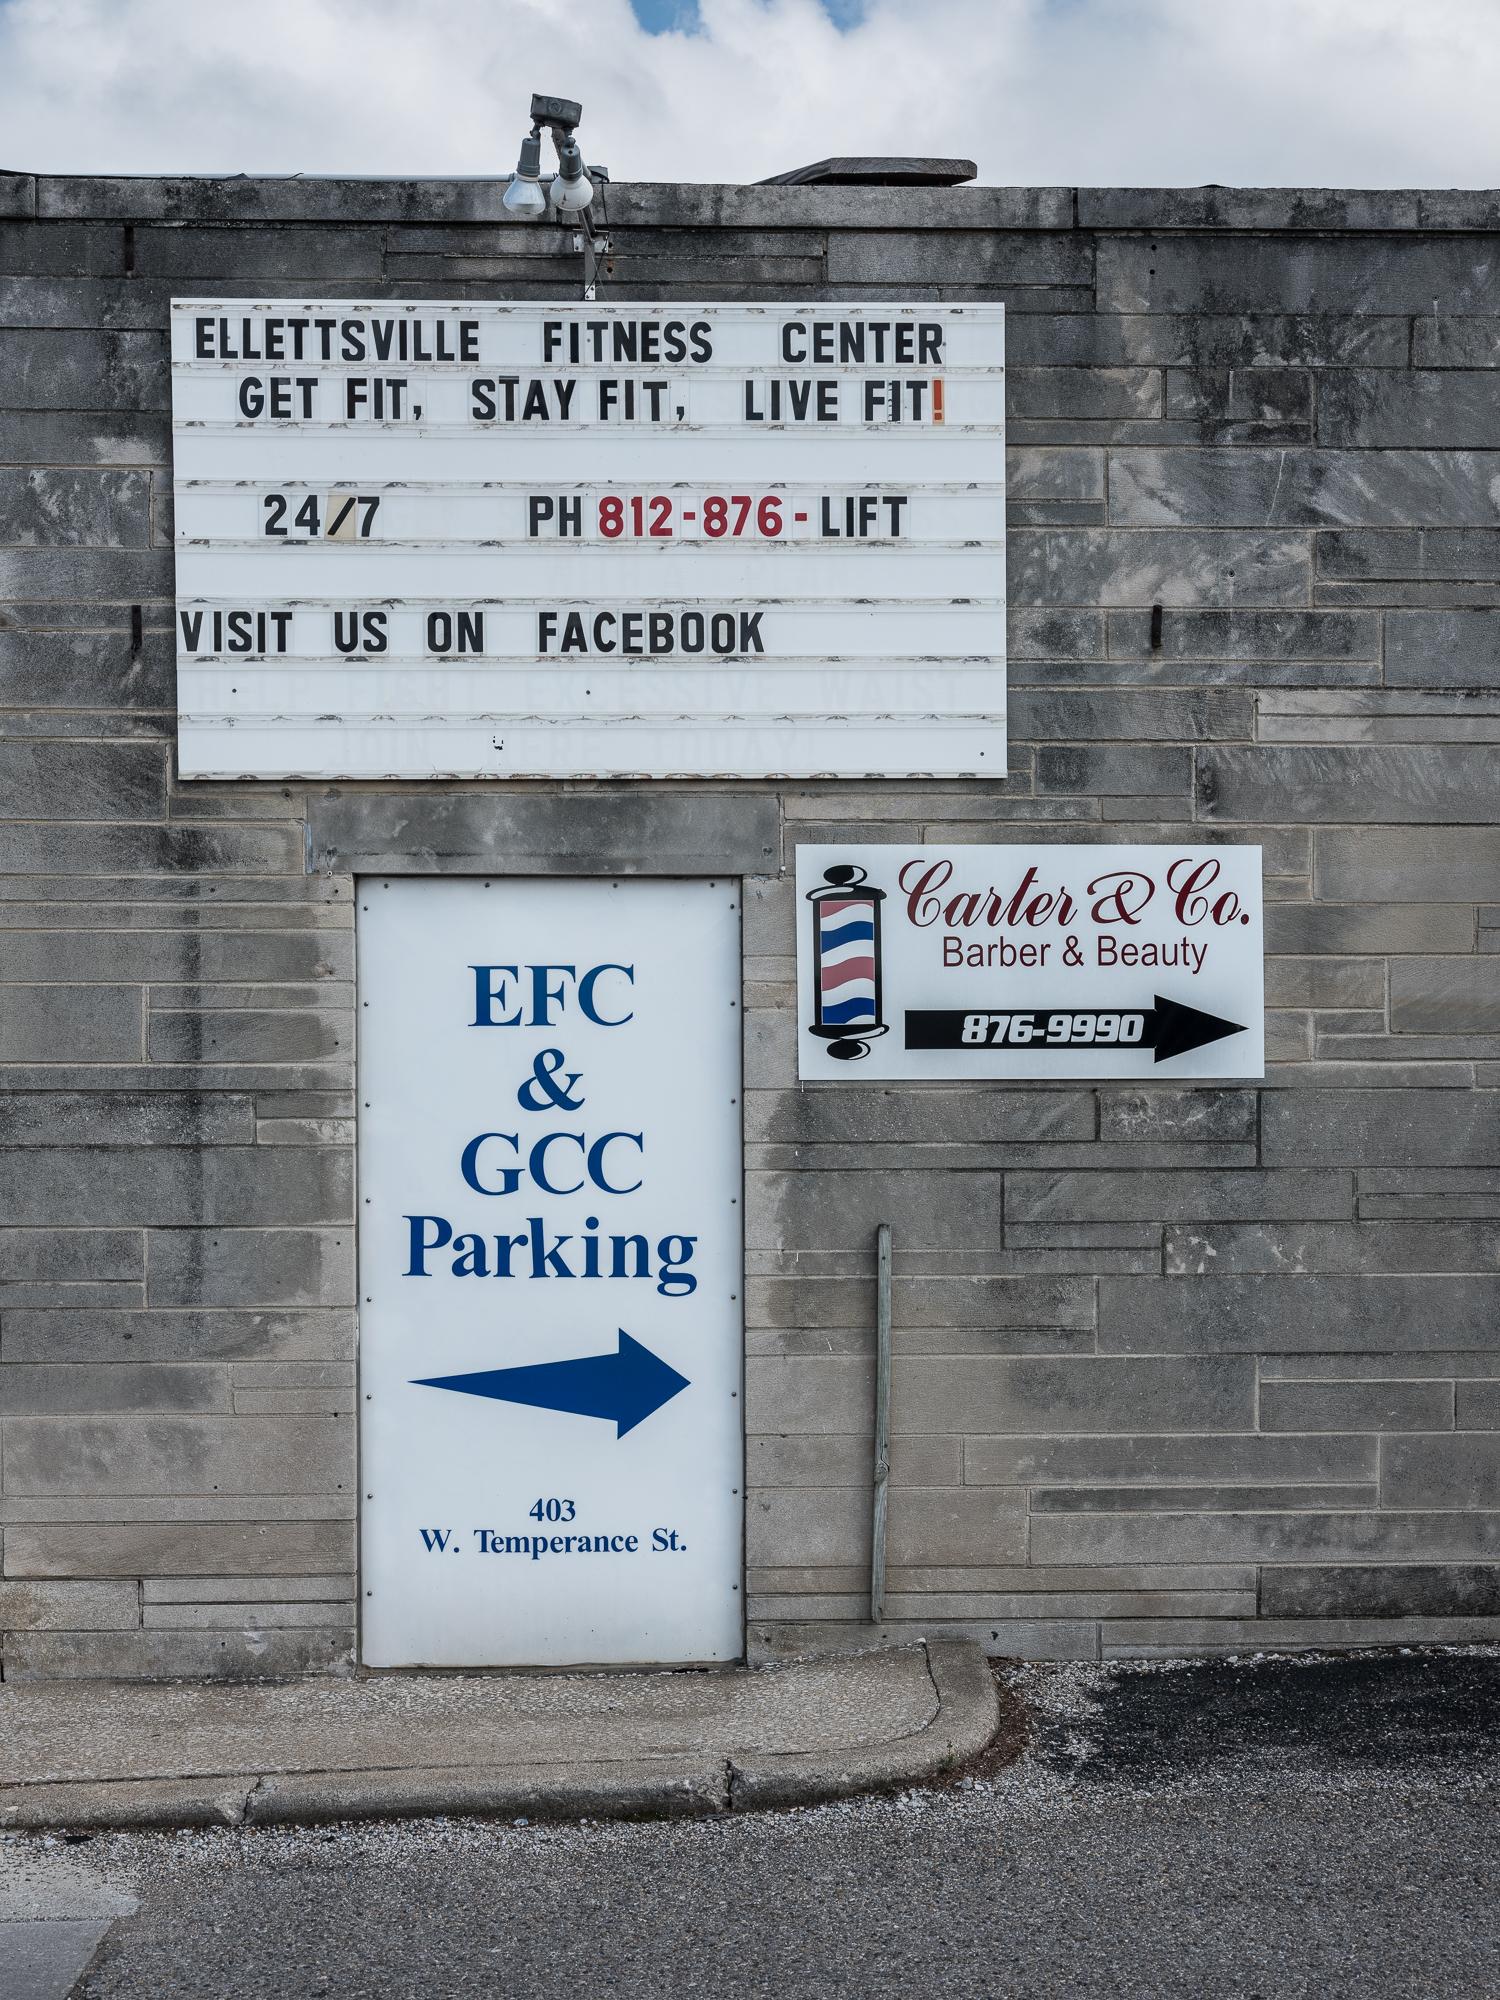 Fitness Center, Ellettsville, Indiana, 2018